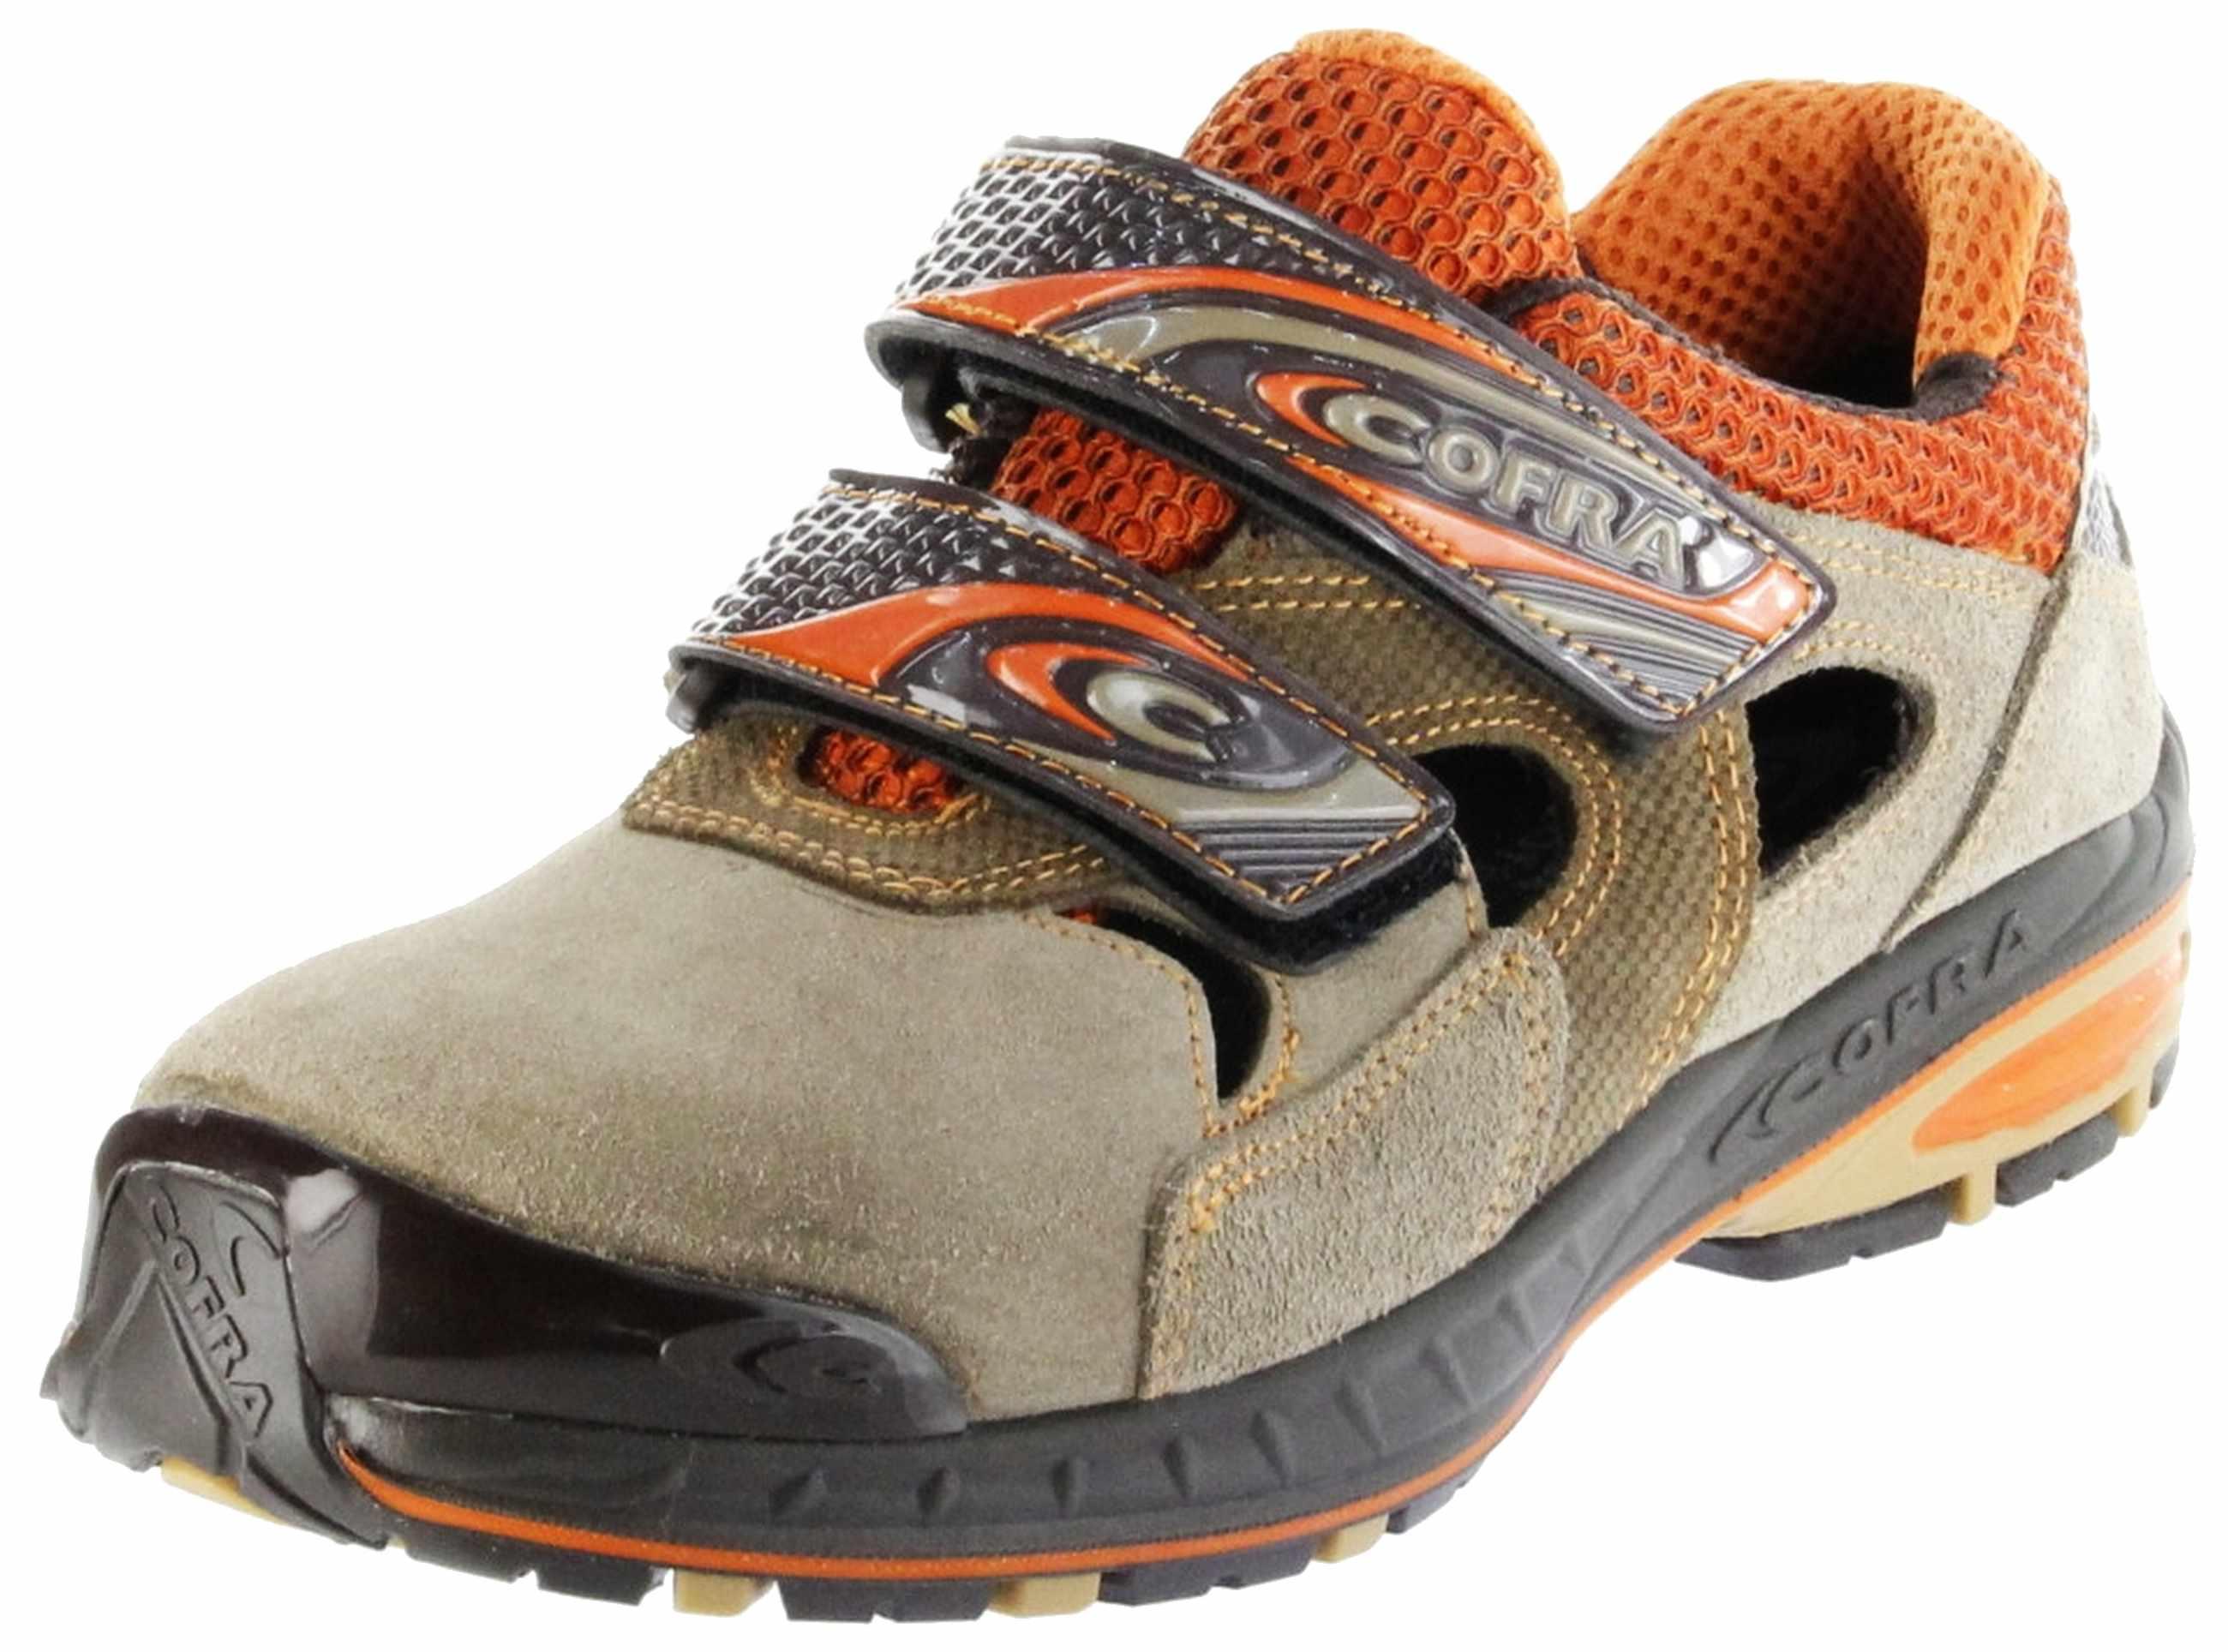 best service fc507 96b14 Cofra Sicherheitsschuhe beige S1P-SRC Arbeitsschuhe Herren SHUTOUT Jogging